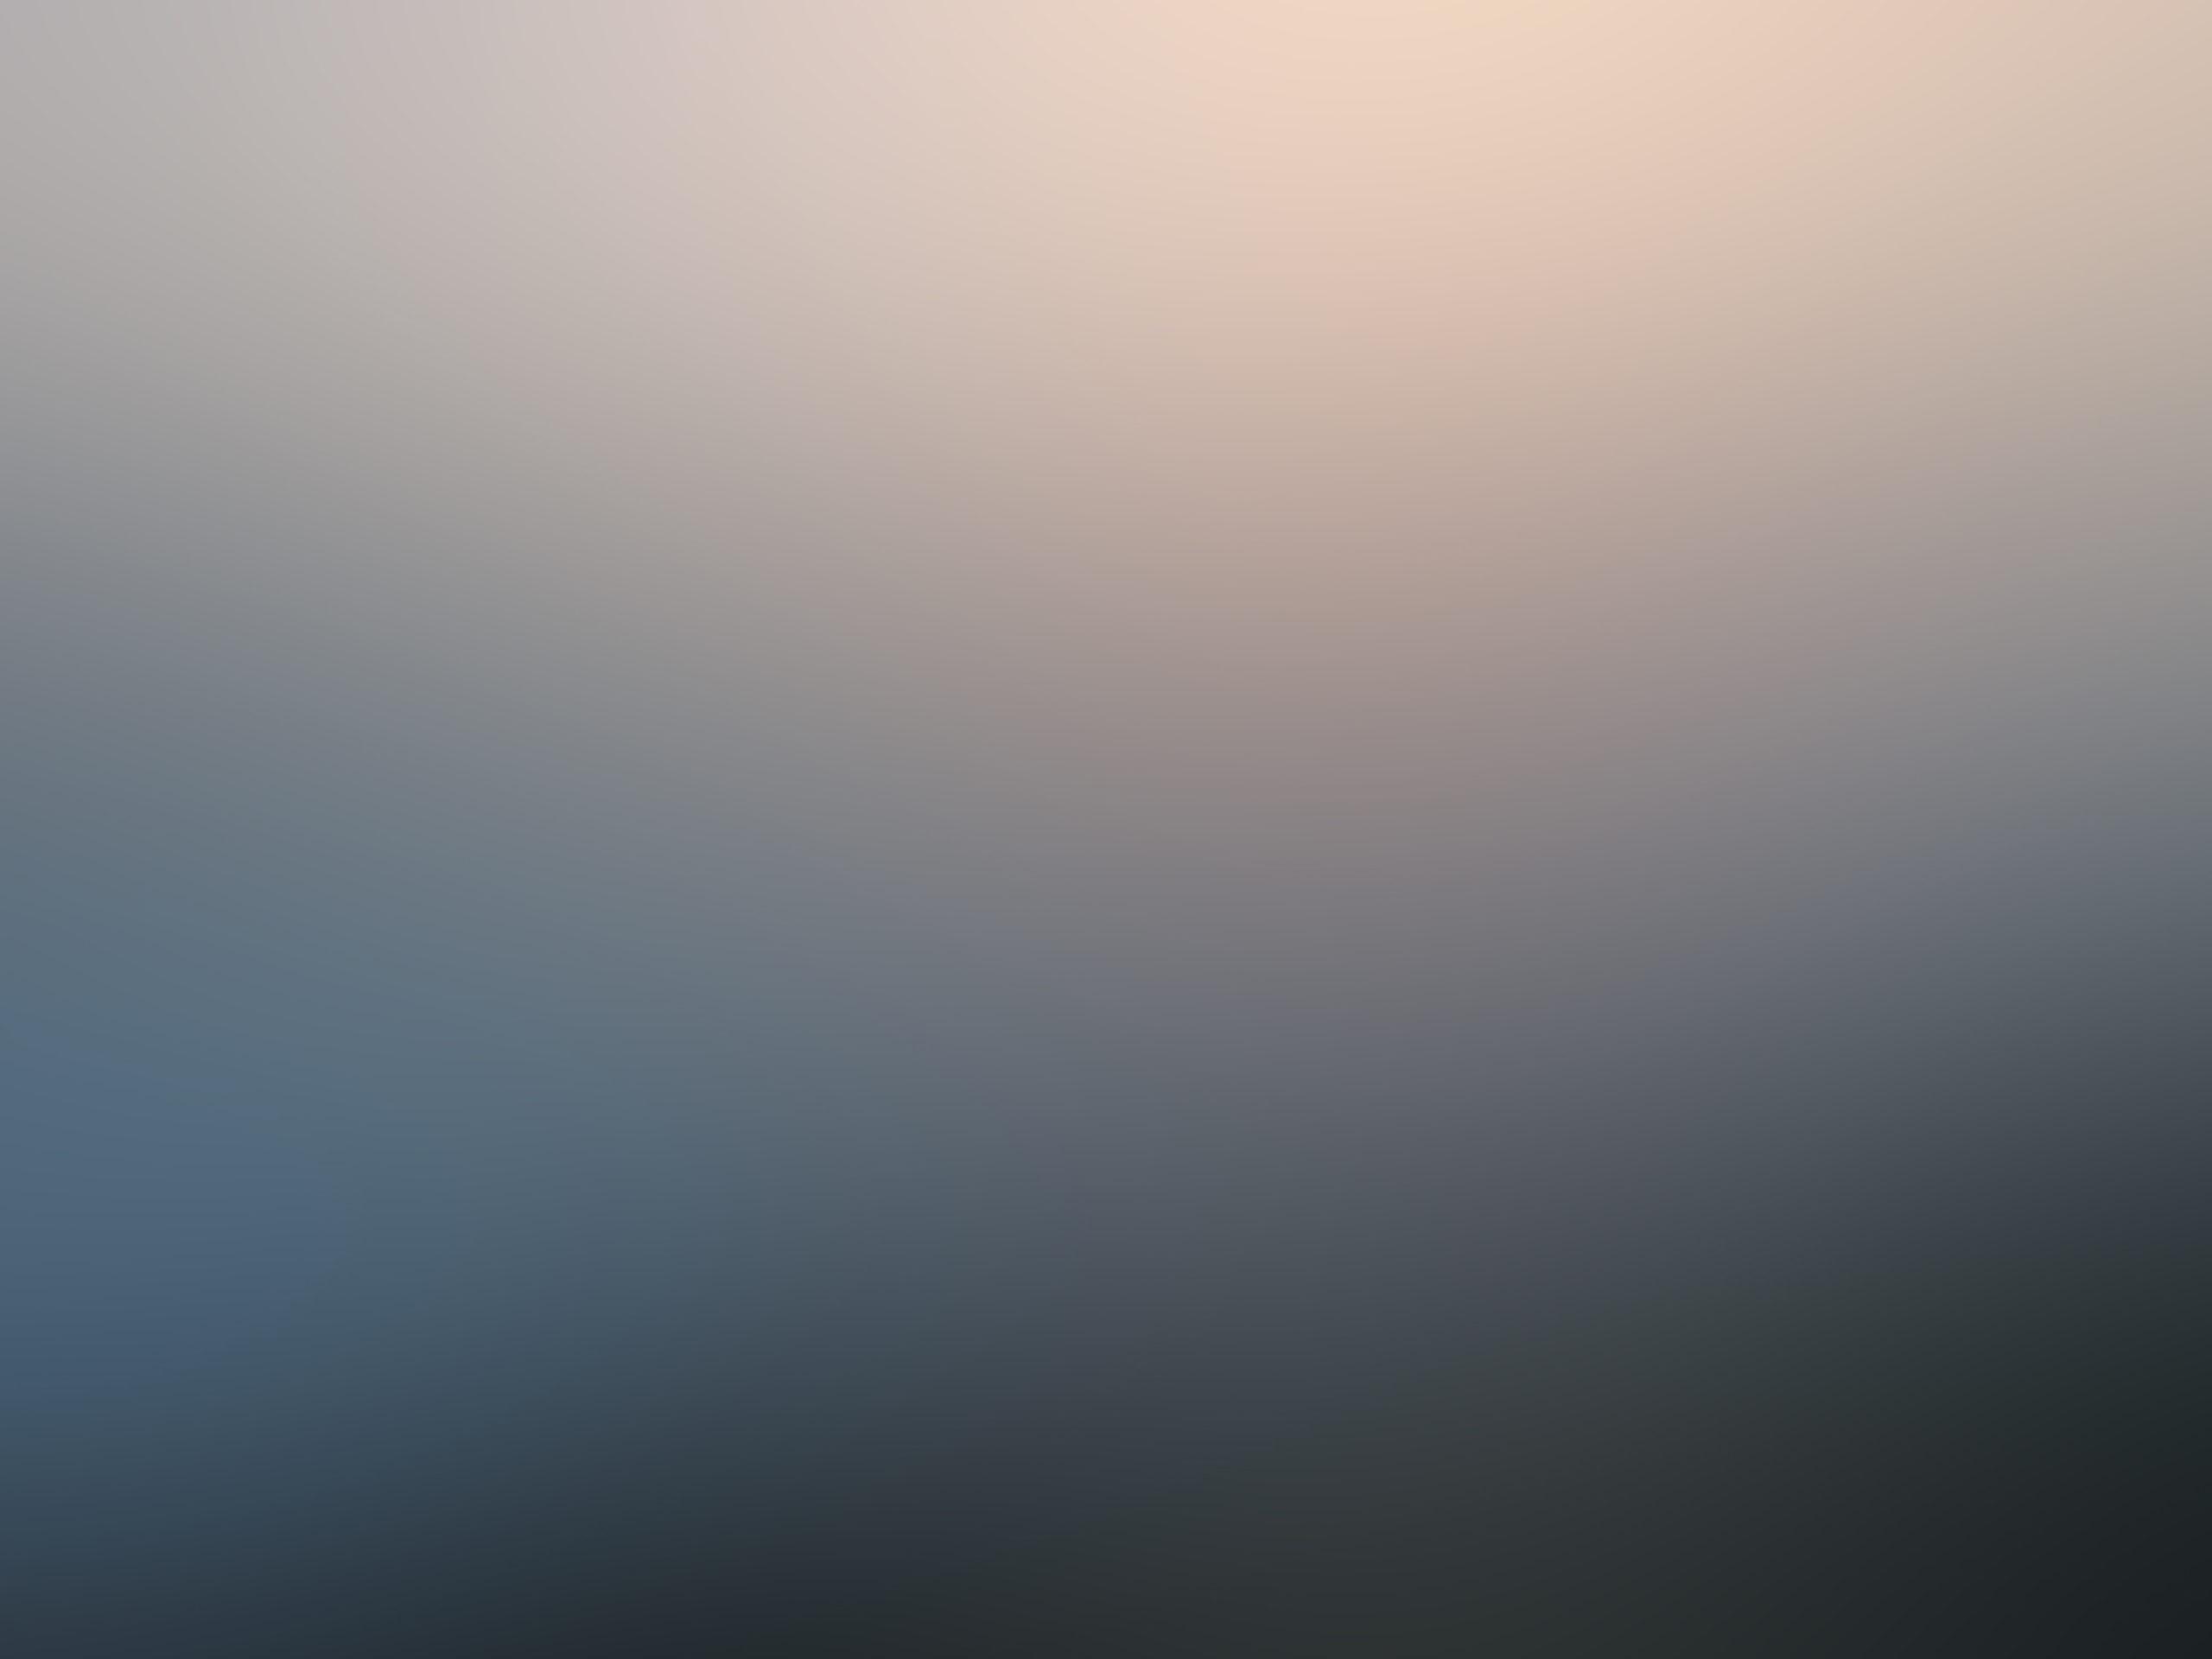 blurred-background-1